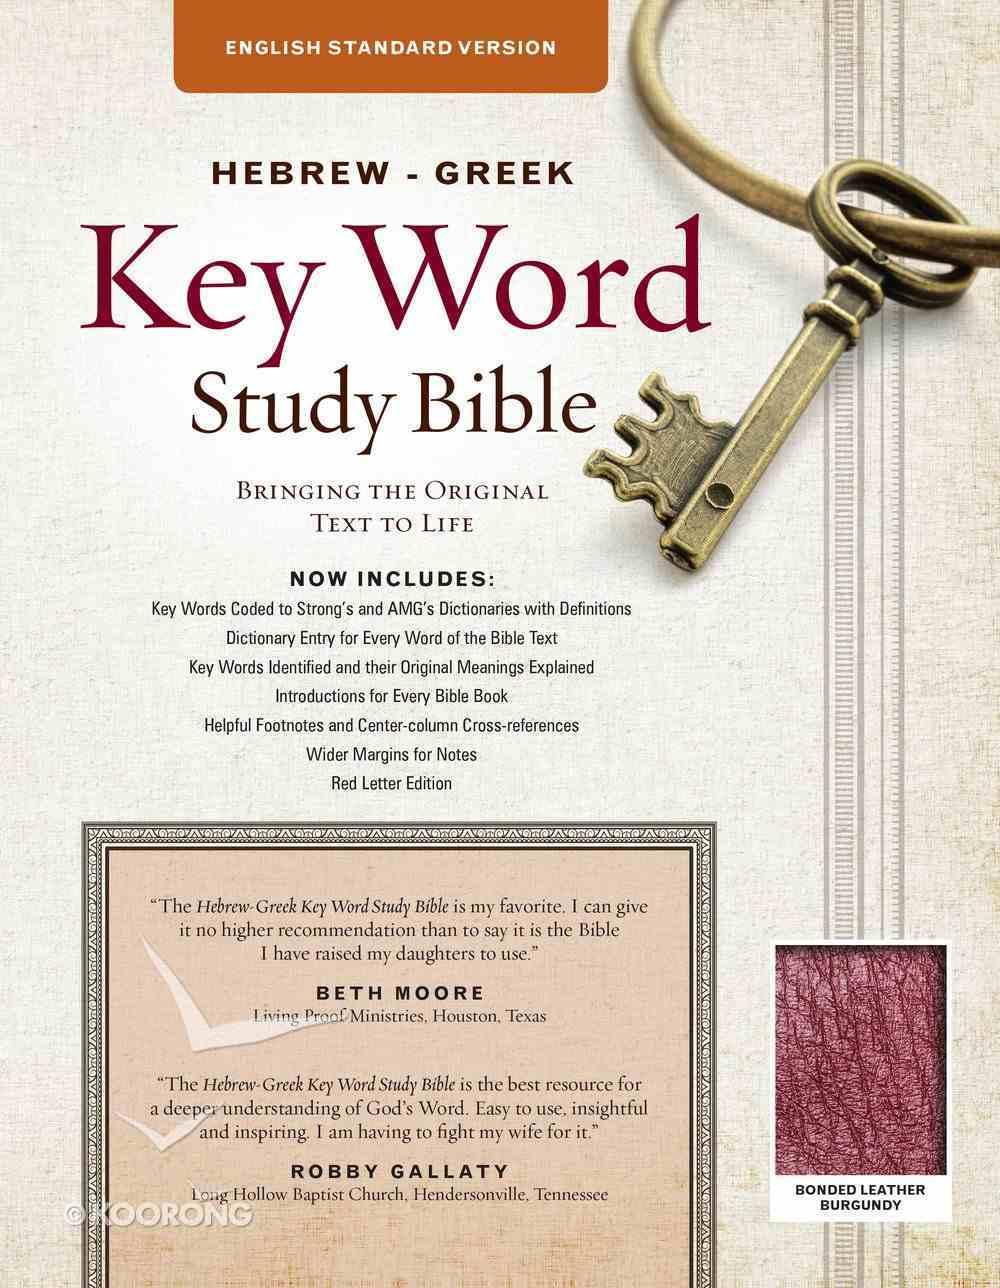 The ESV Hebrew-Greek Key Word Study Bible (Burgundy) Bonded Leather